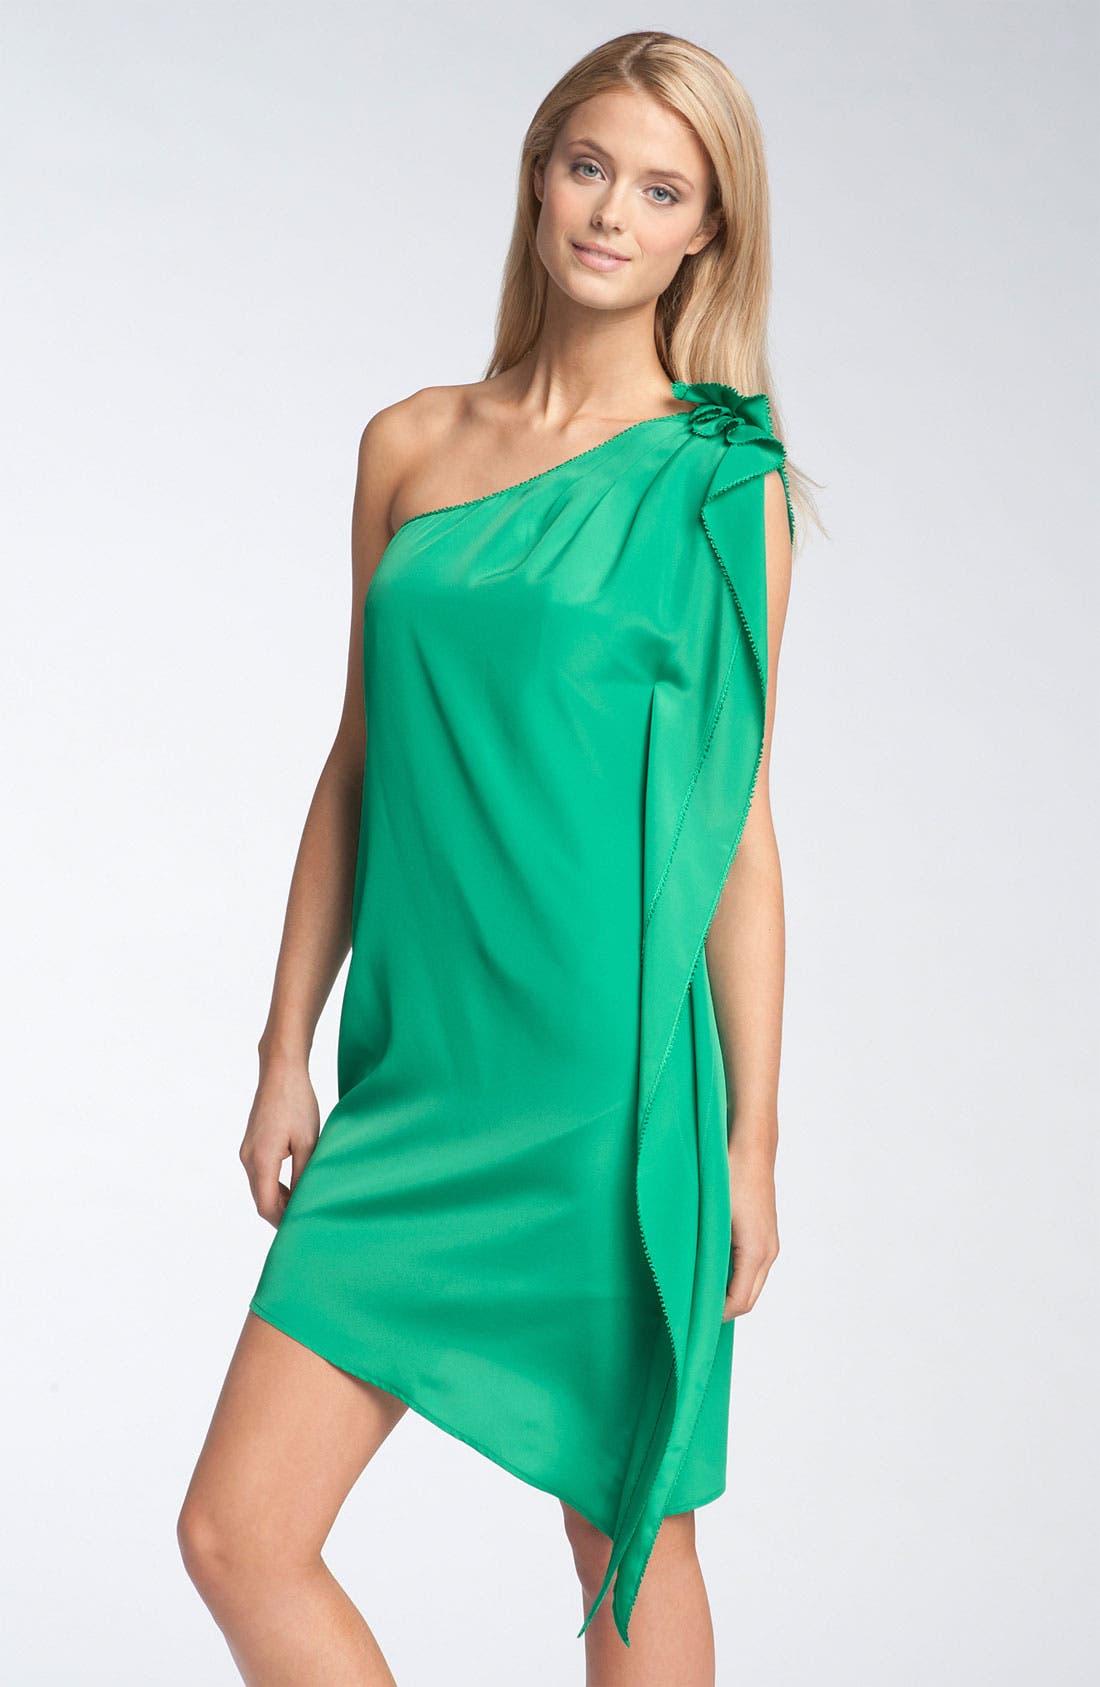 Main Image - Jessica Simpson One Shoulder Ruffle Dress